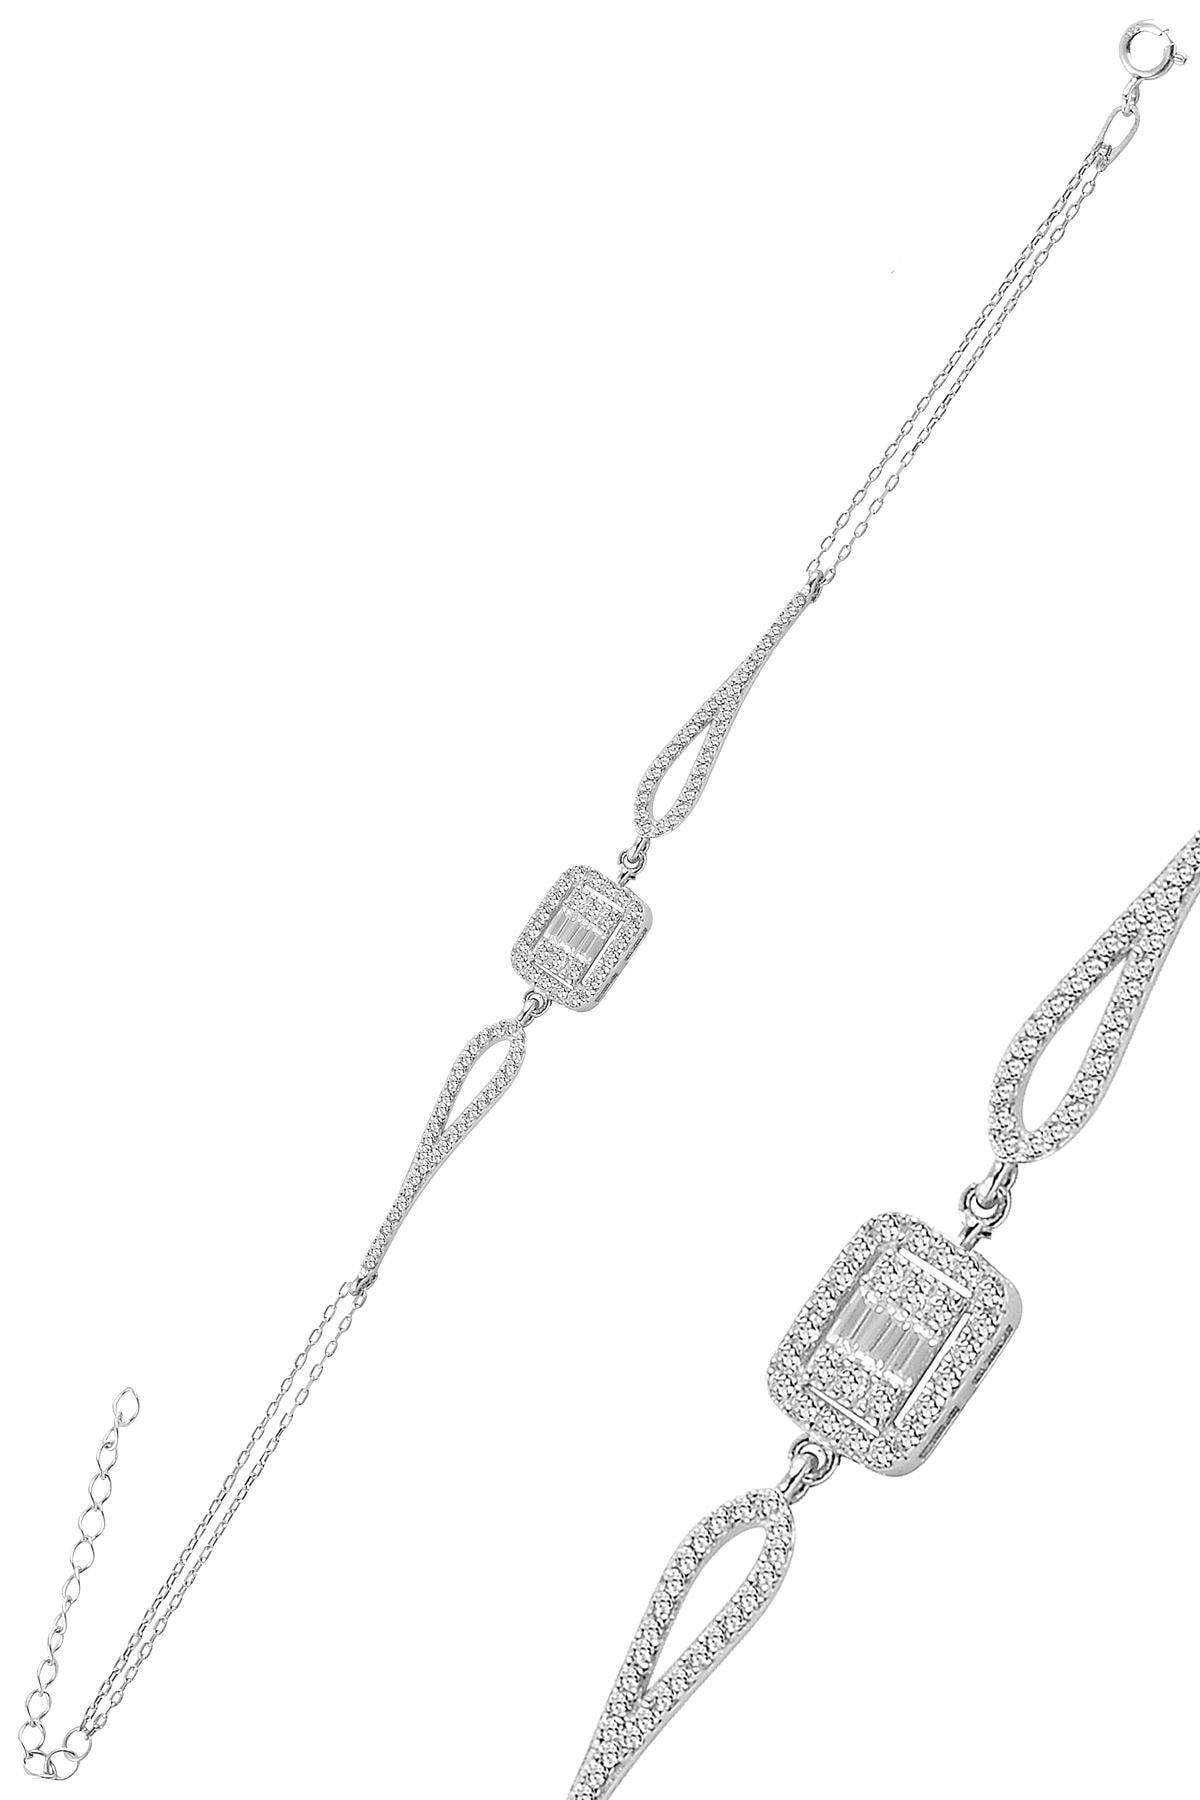 Söğütlü Silver Gümüş Rodyumlu Zirkon Baget Taşlı Bileklik. 1